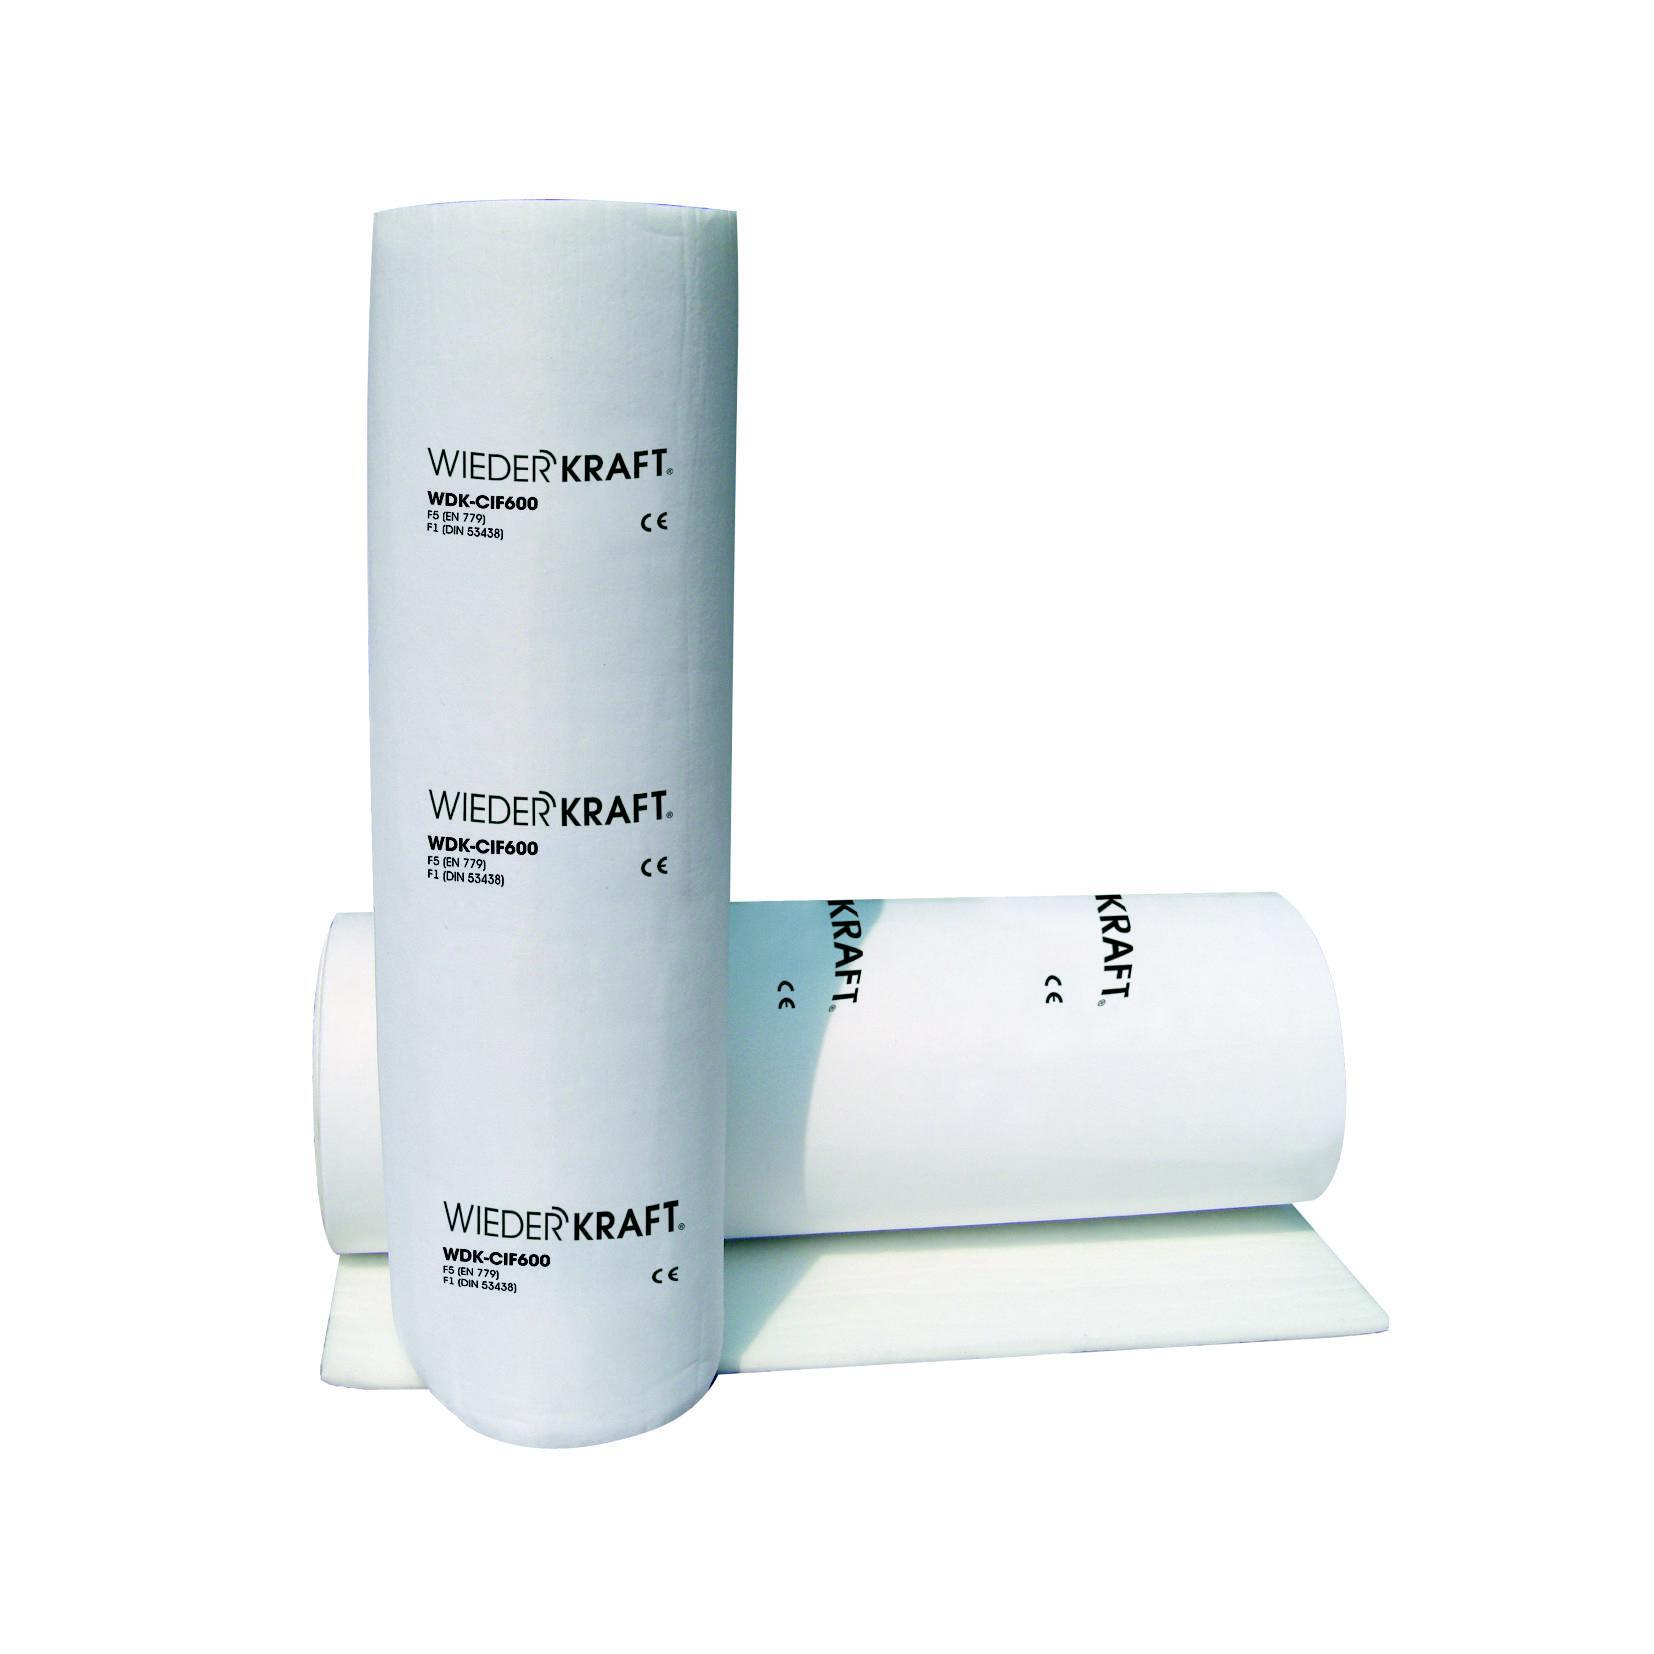 Фильтр Wiederkraft Wdk-cif600 (2,4м х 20м) домкрат wiederkraft wdk 81020